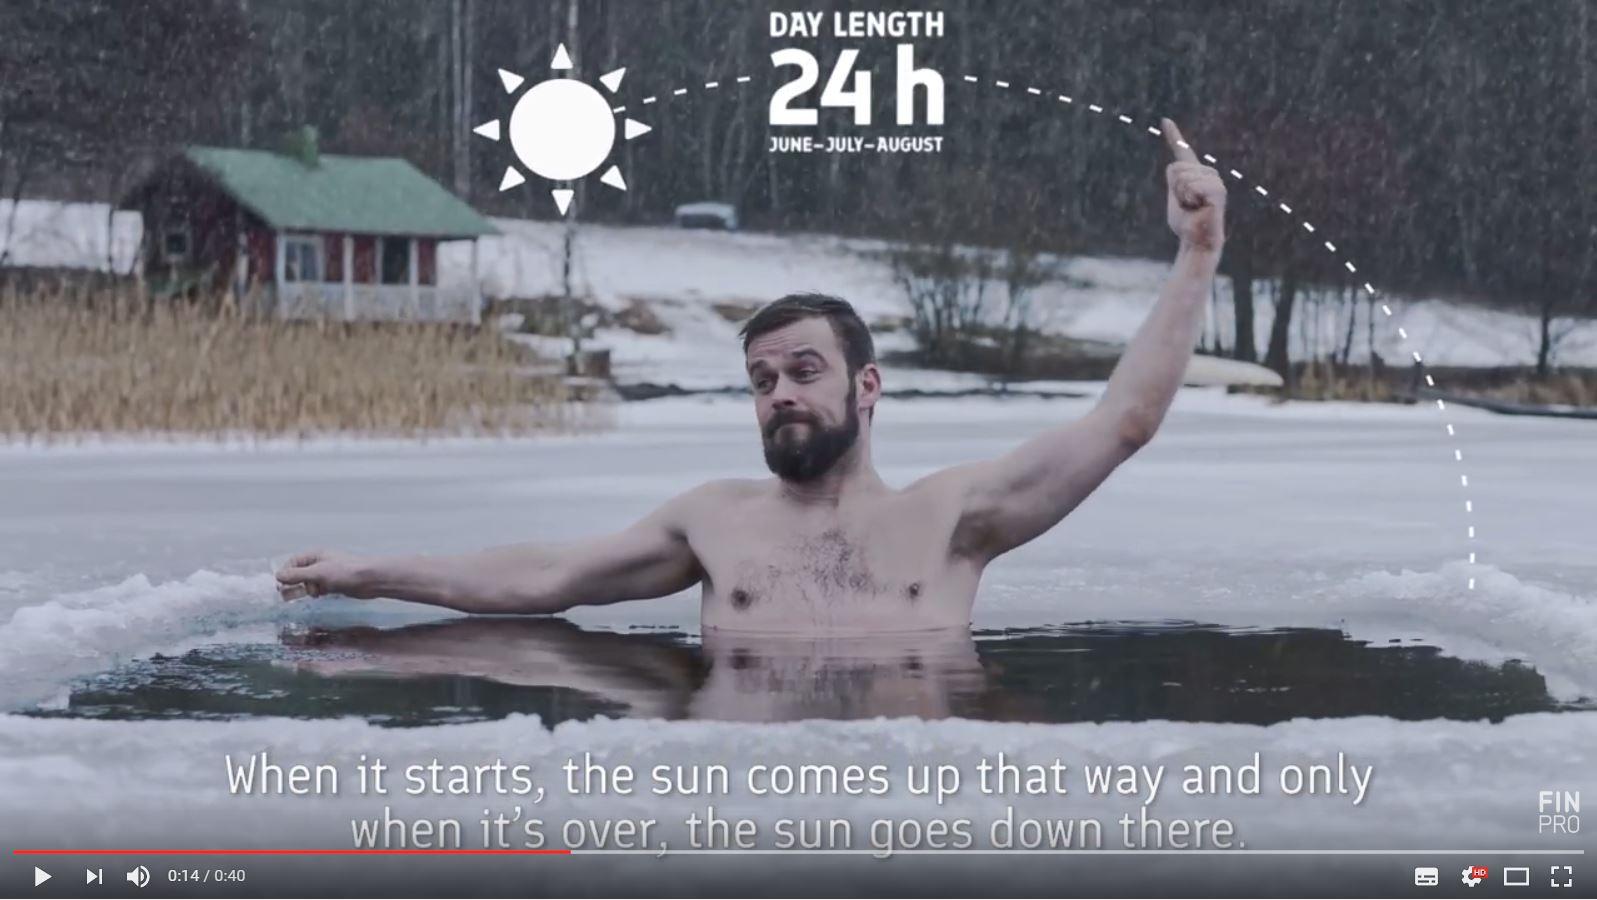 Mahtava Suomi -kampanja Saksassa